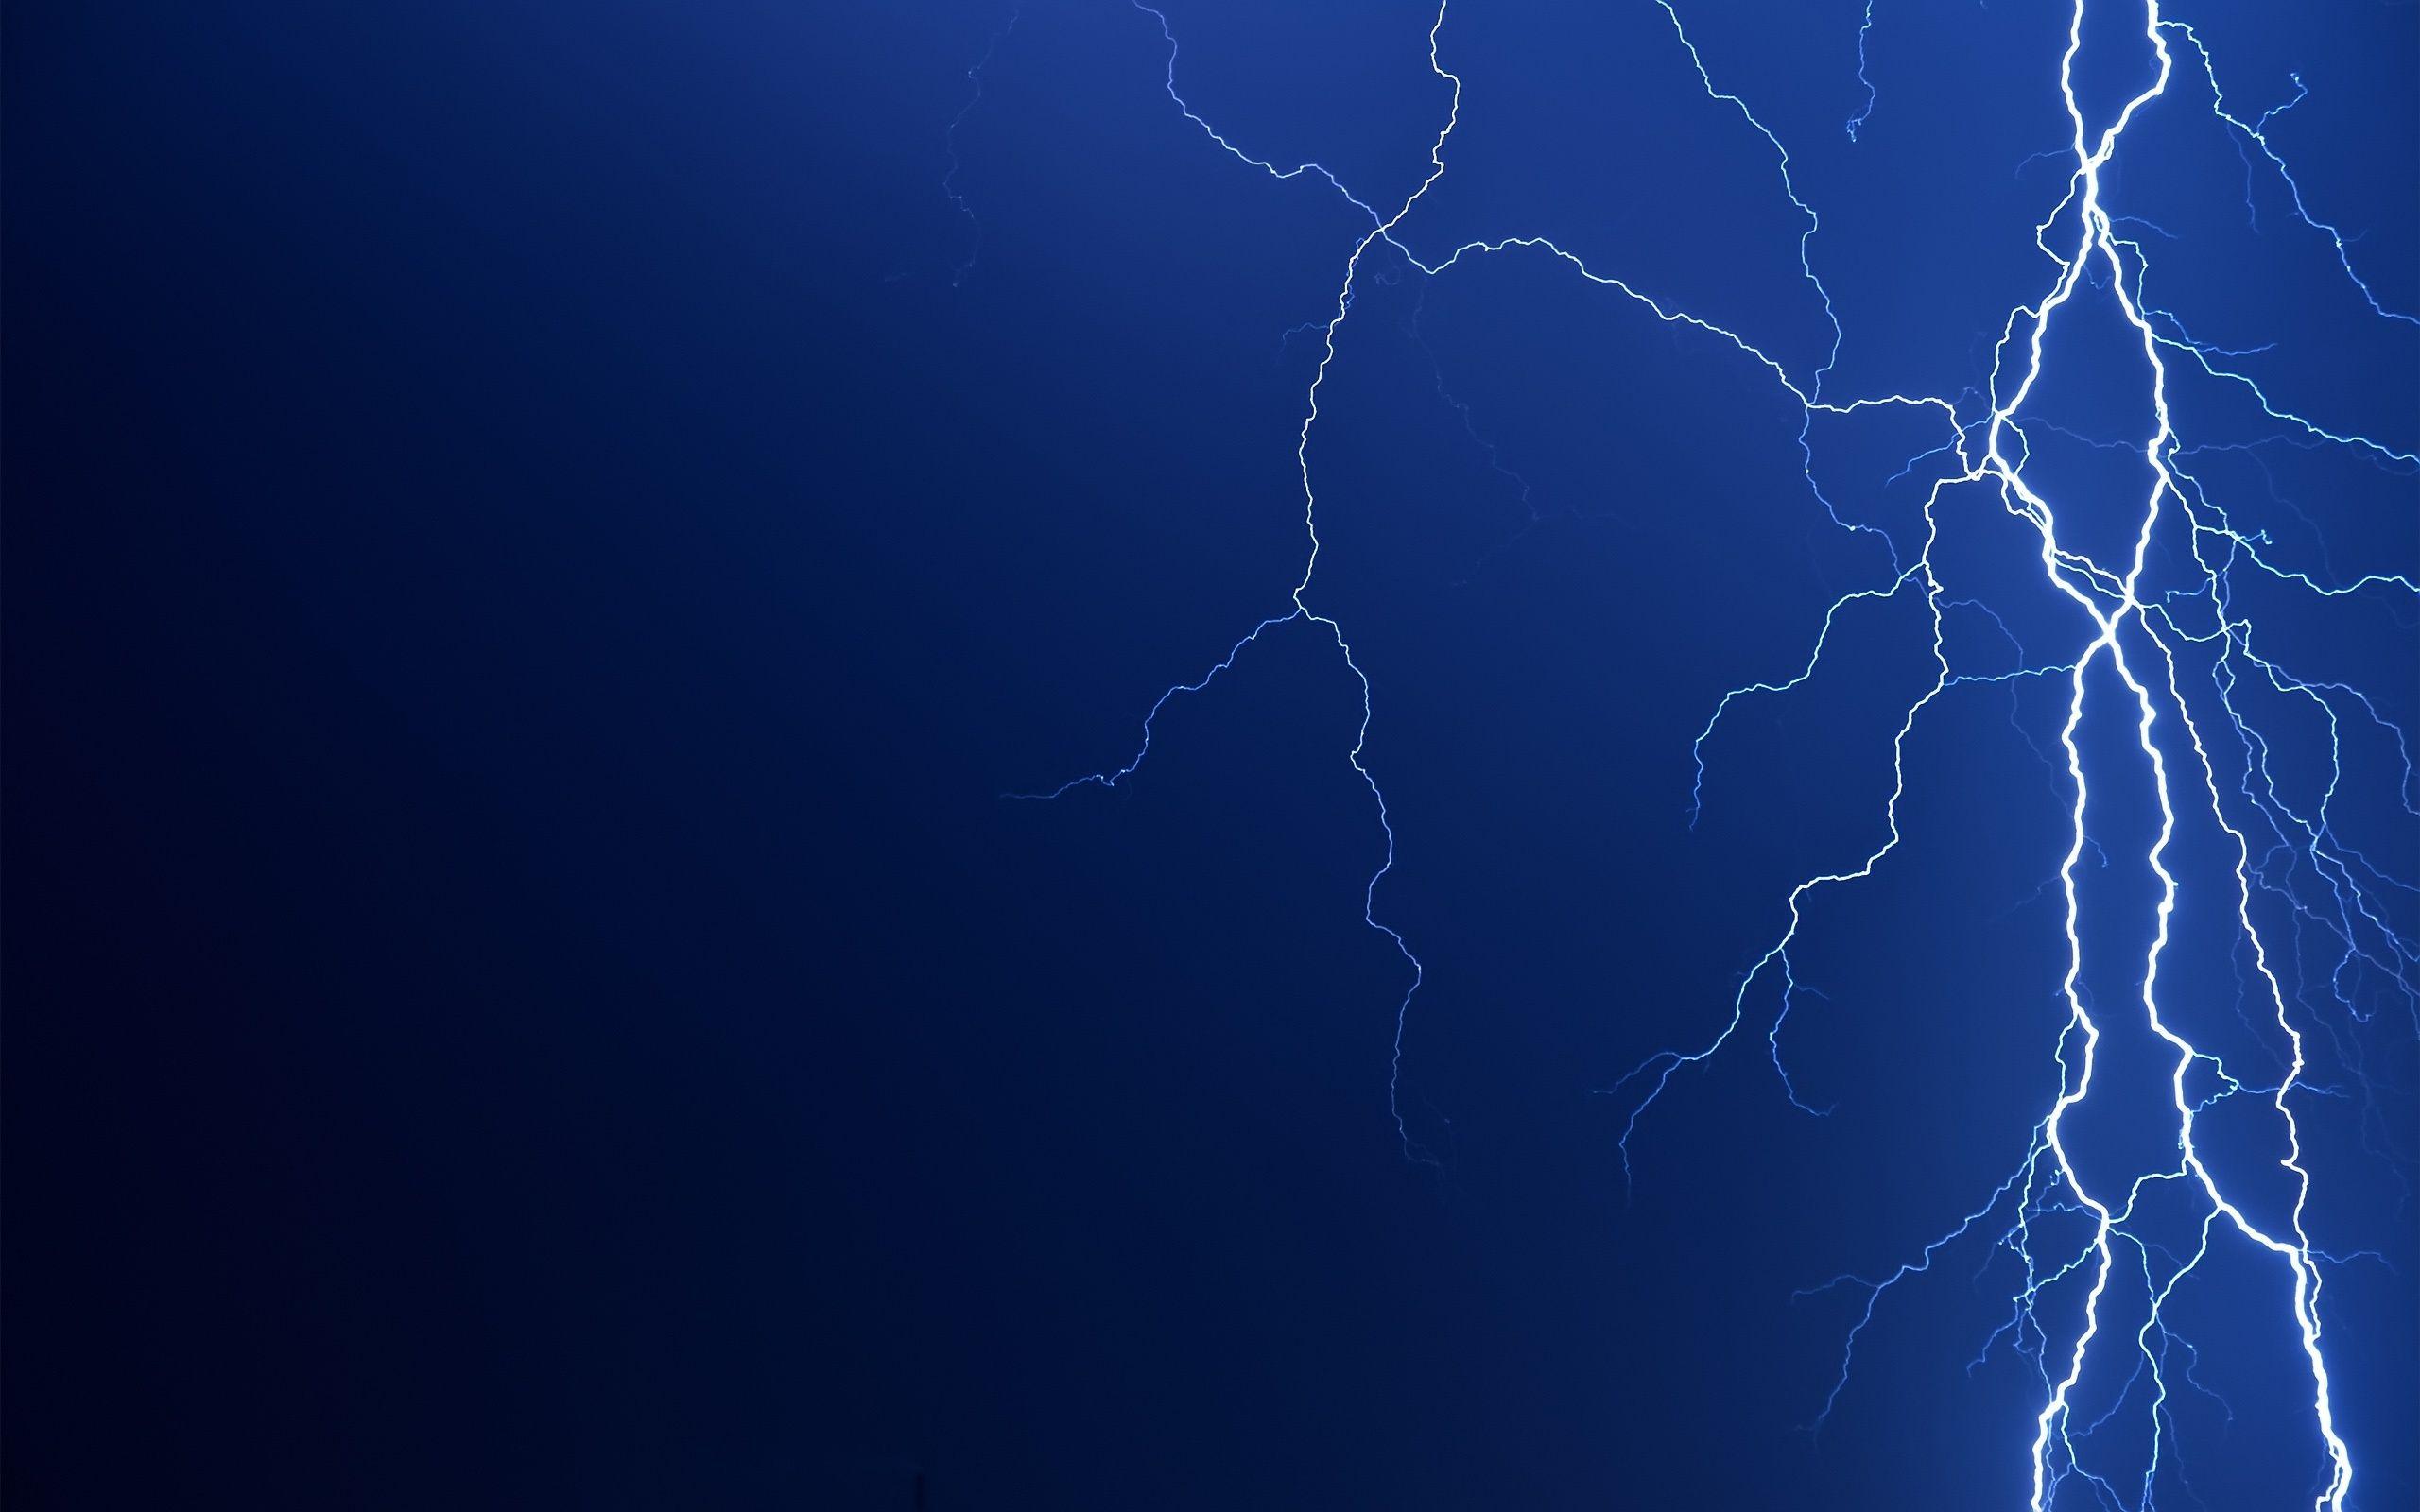 Lightning 2560x1600 Lightning Bolt Desktop Pc And Mac Wallpaper Lightning Images Storm Wallpaper Lightning